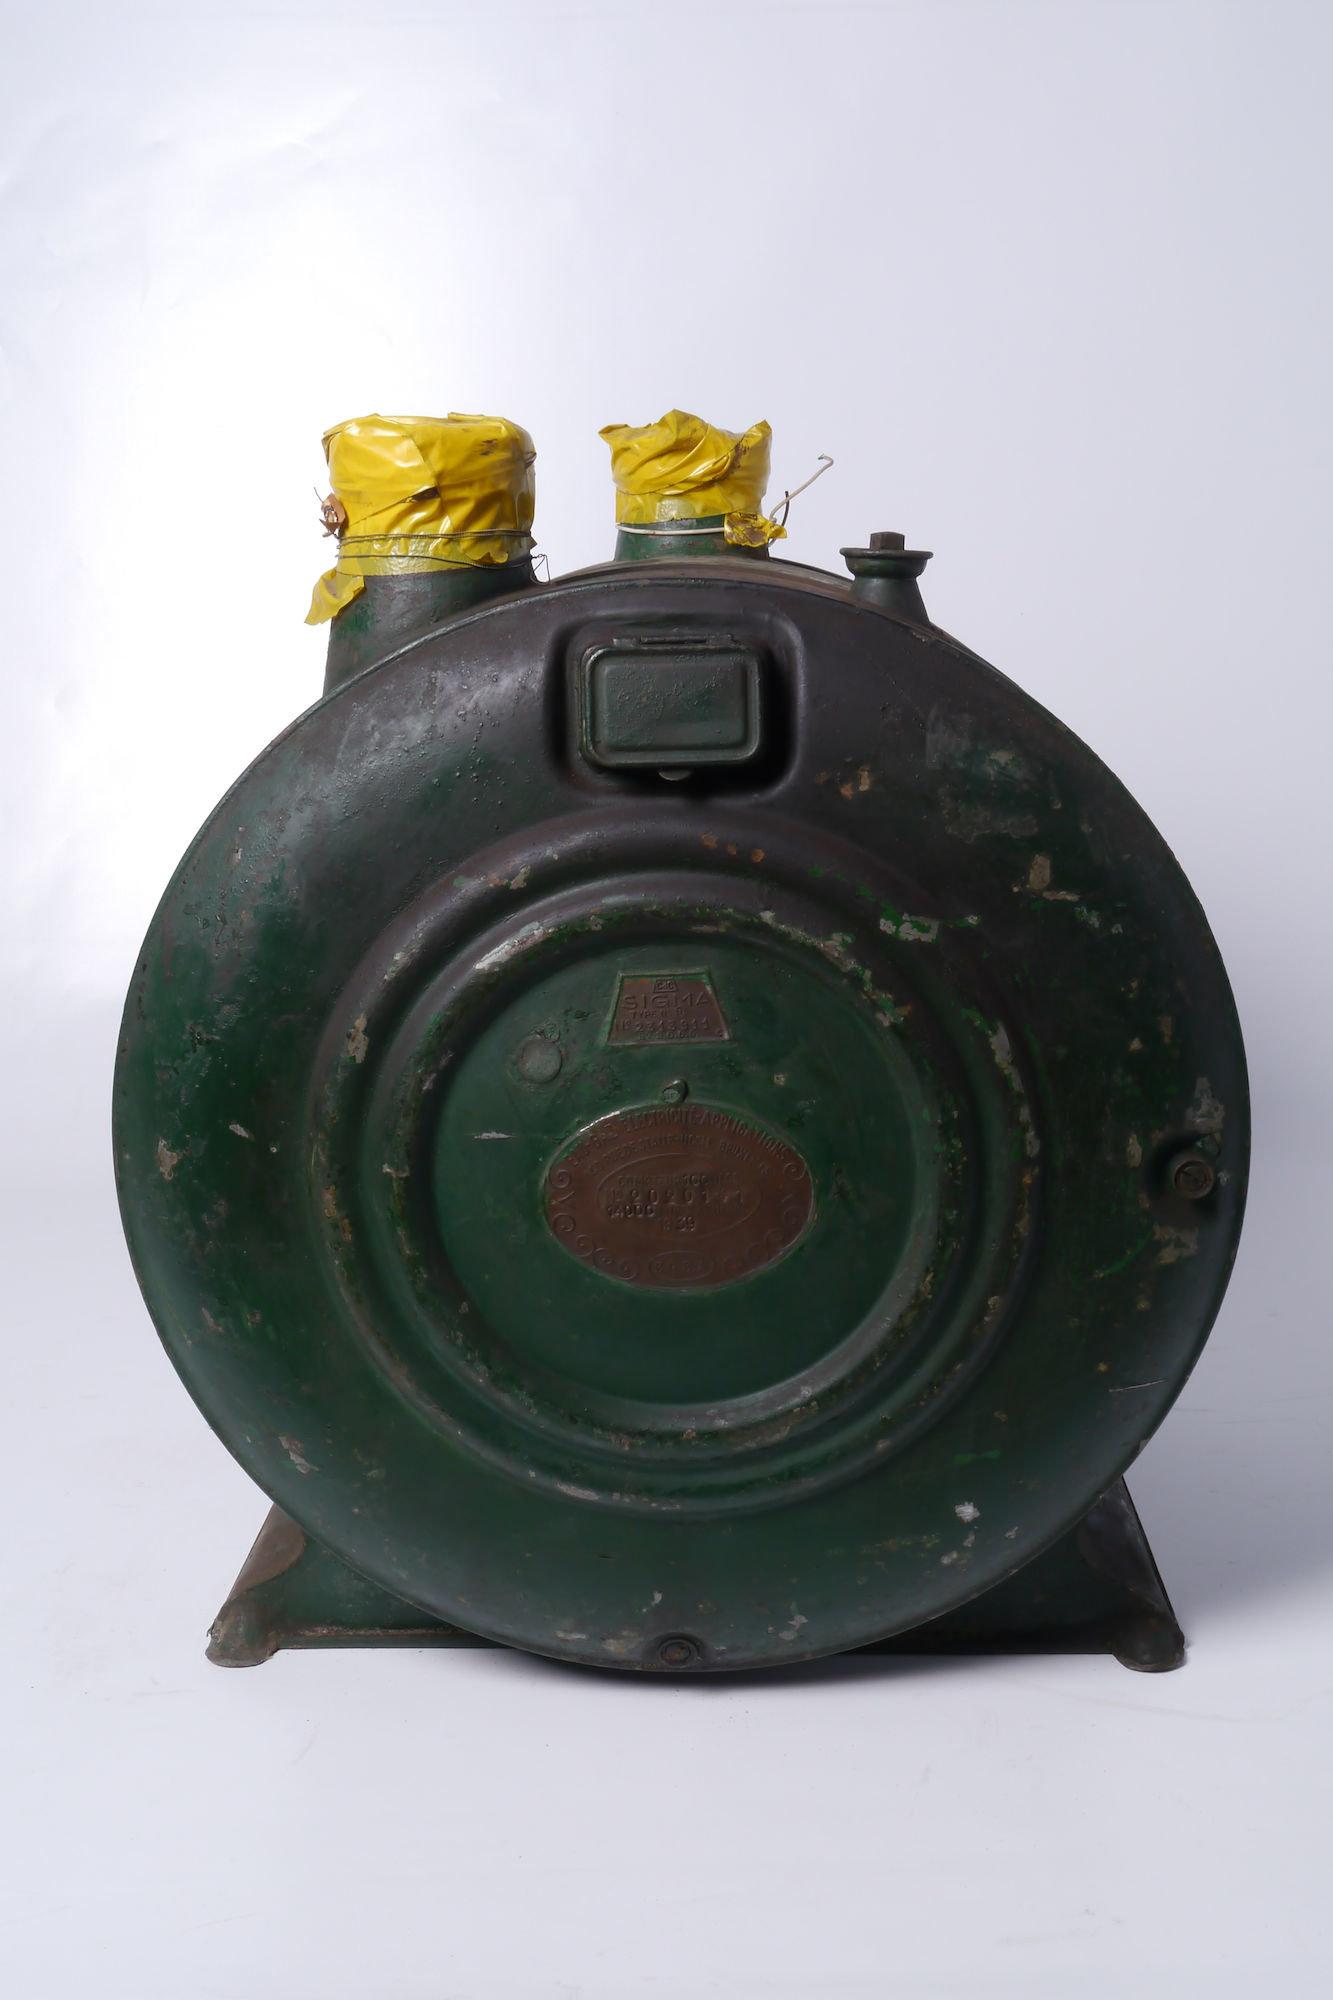 Verbruiksmeter voor gas van het merk Compagnie des Compteurs